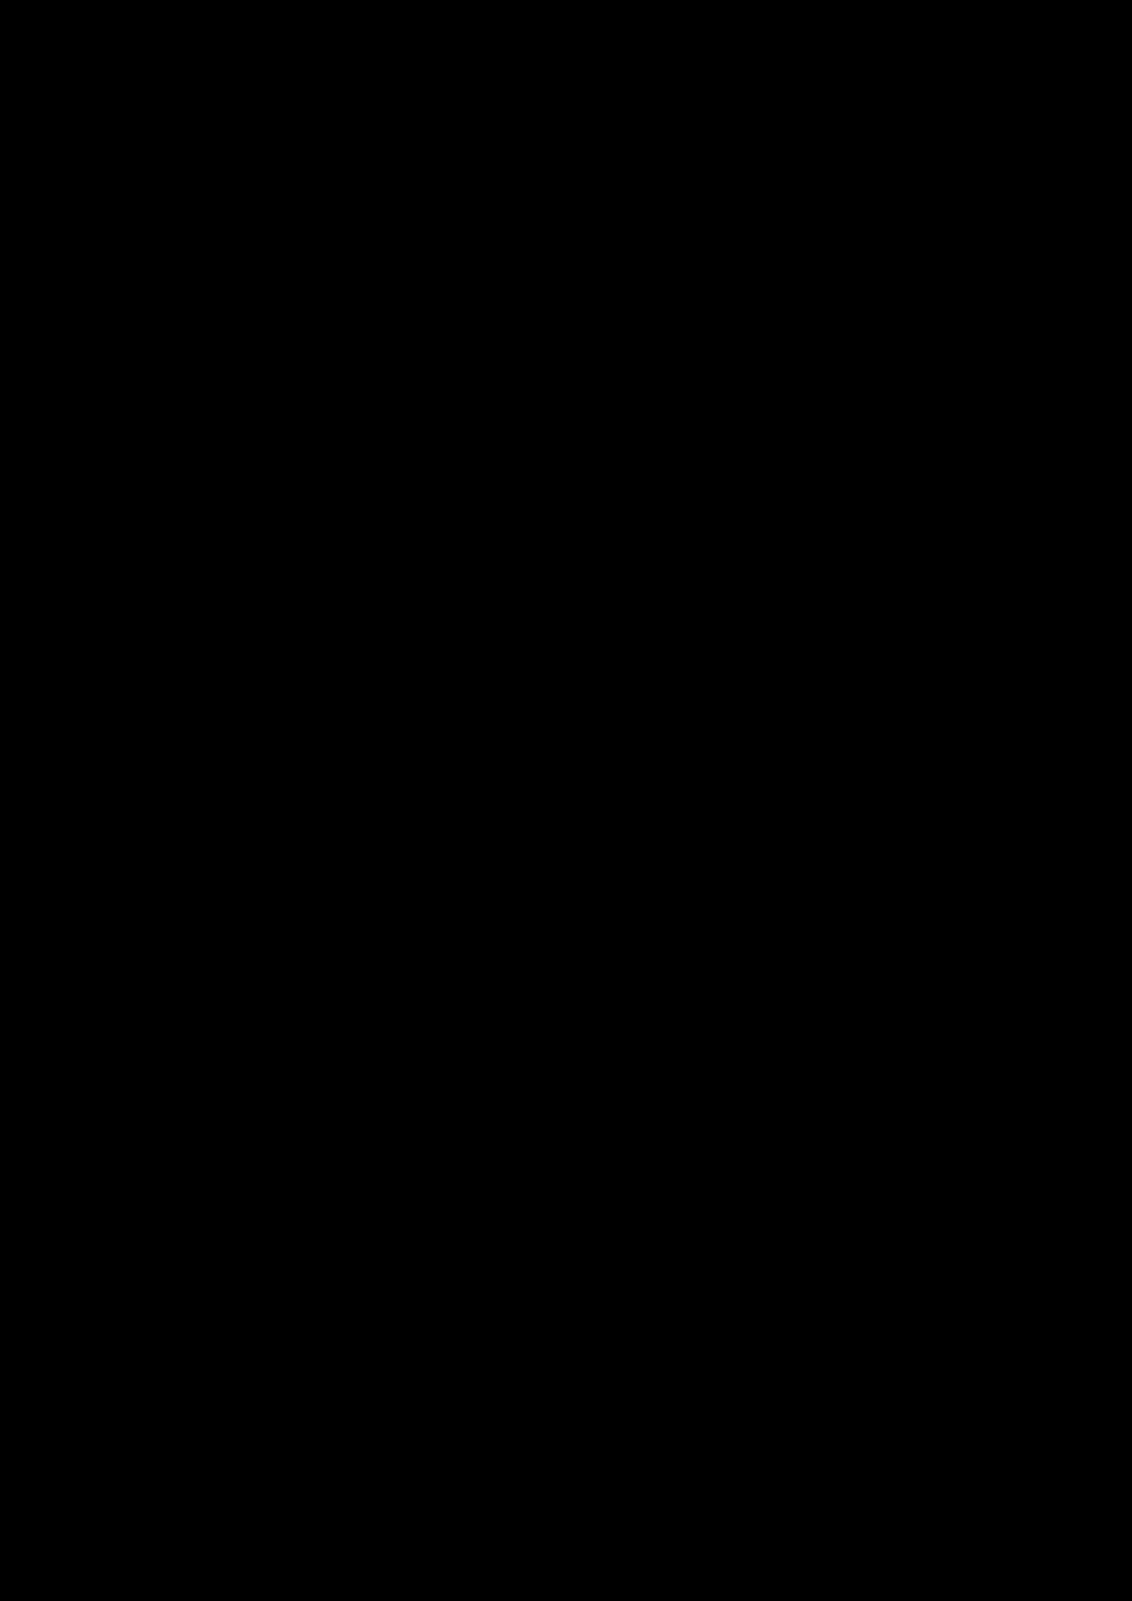 Korolevstvo slez slide, Image 15